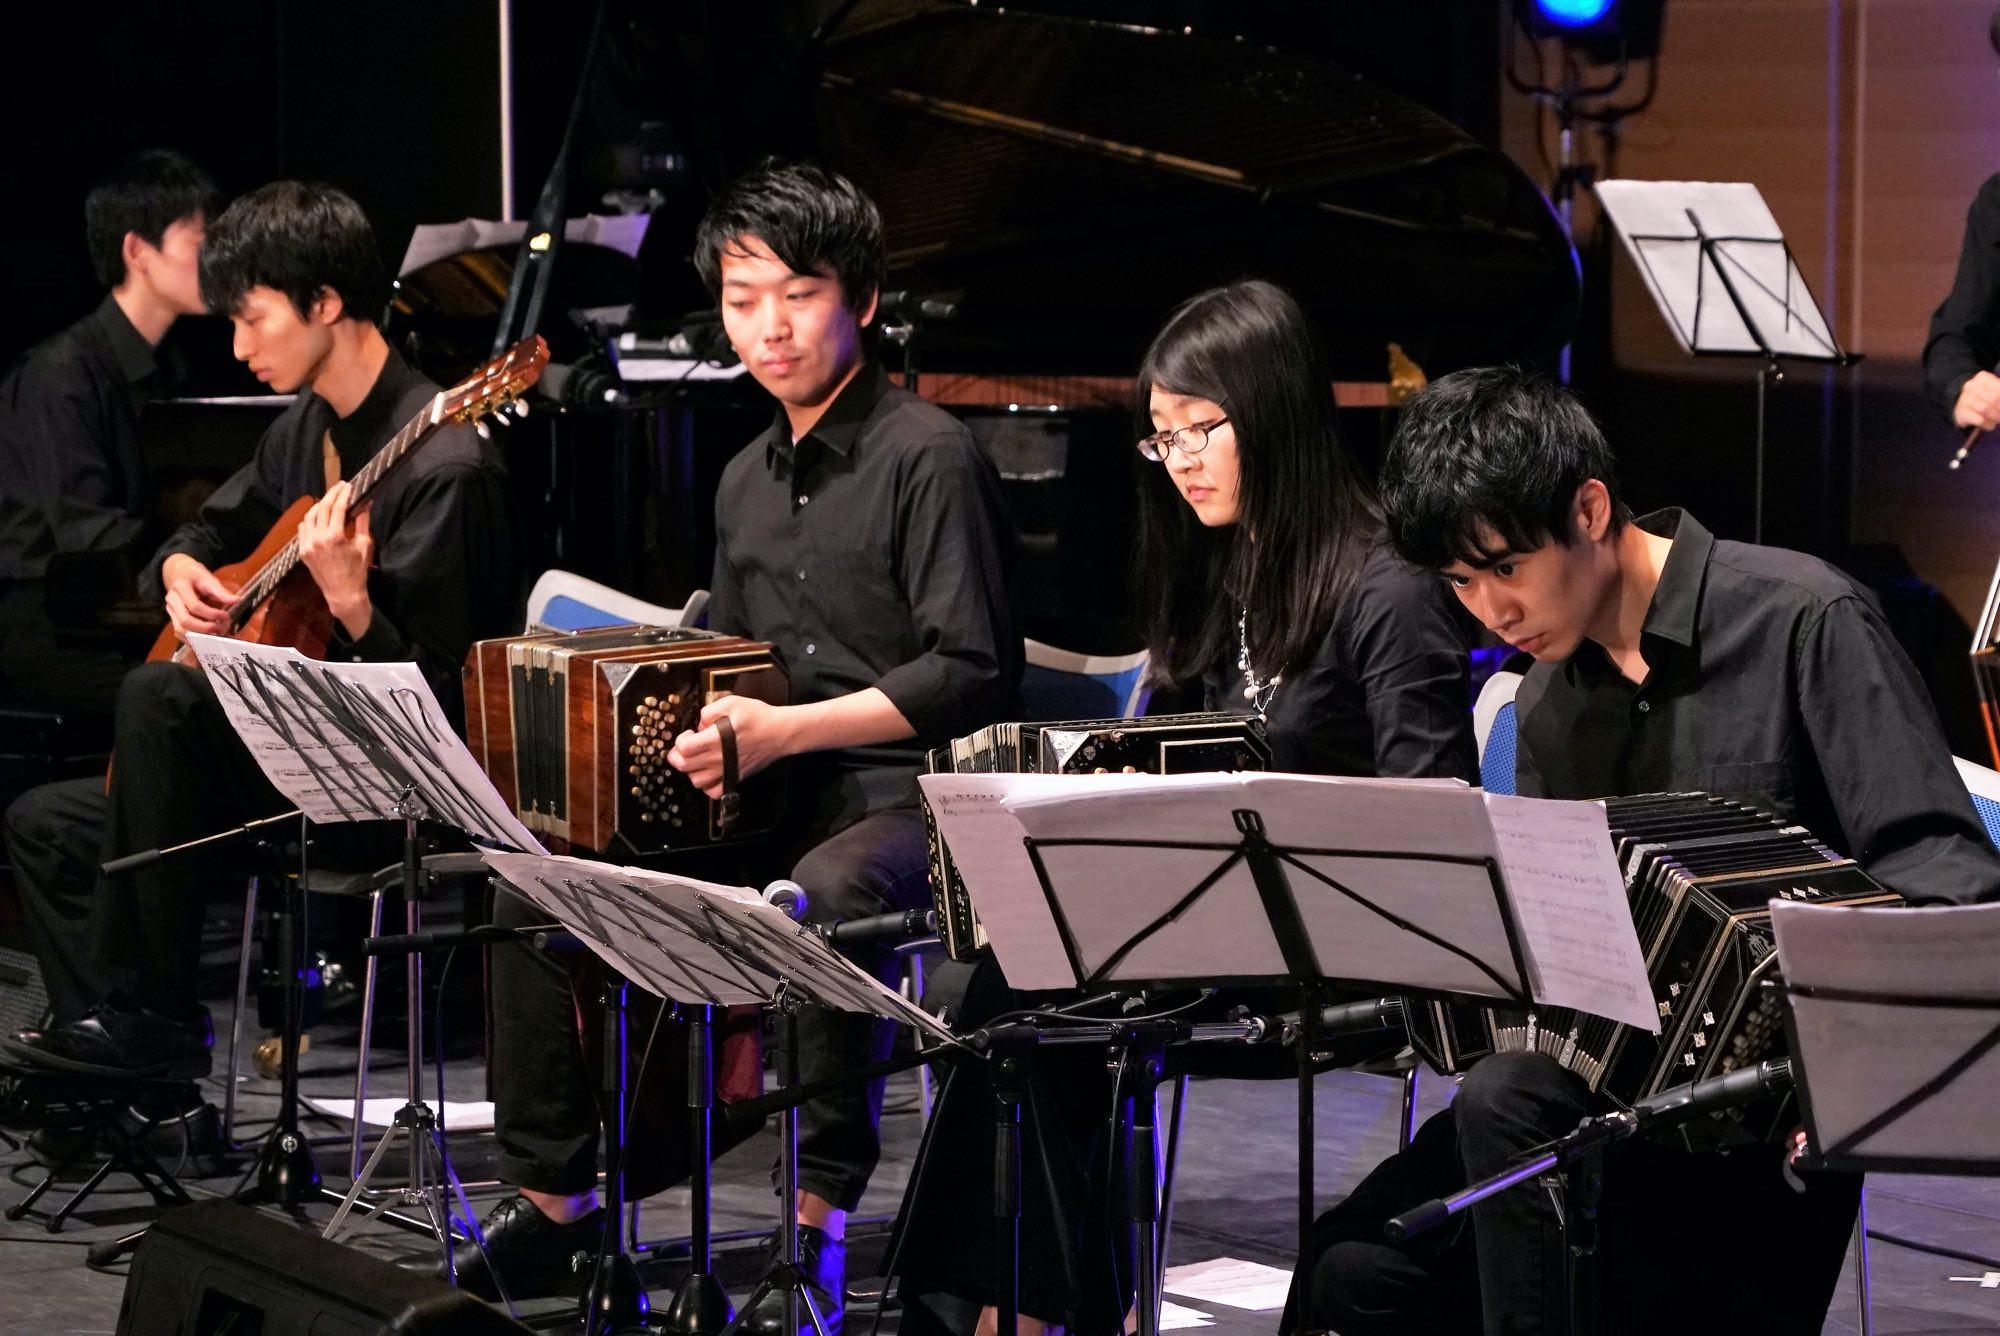 A Break From Argentine Tango in Japan - Yamato Kurebayashi - Orquestra de Tango Waseda